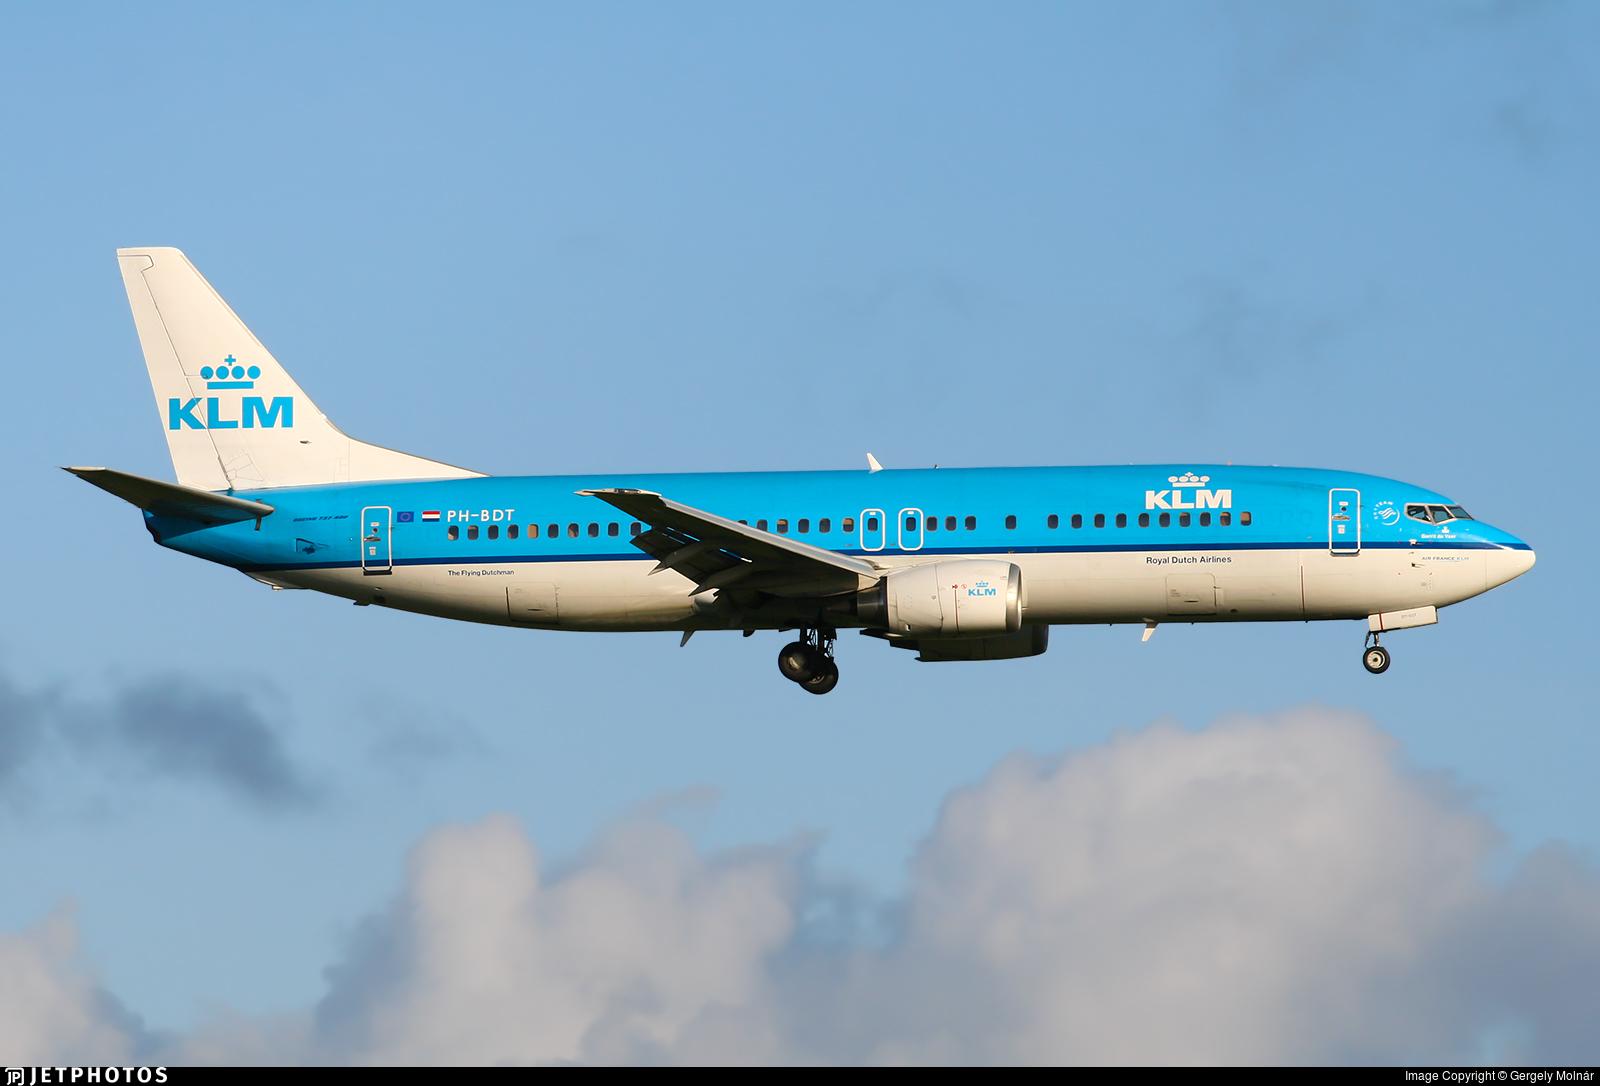 PH-BDT - Boeing 737-406 - KLM Royal Dutch Airlines